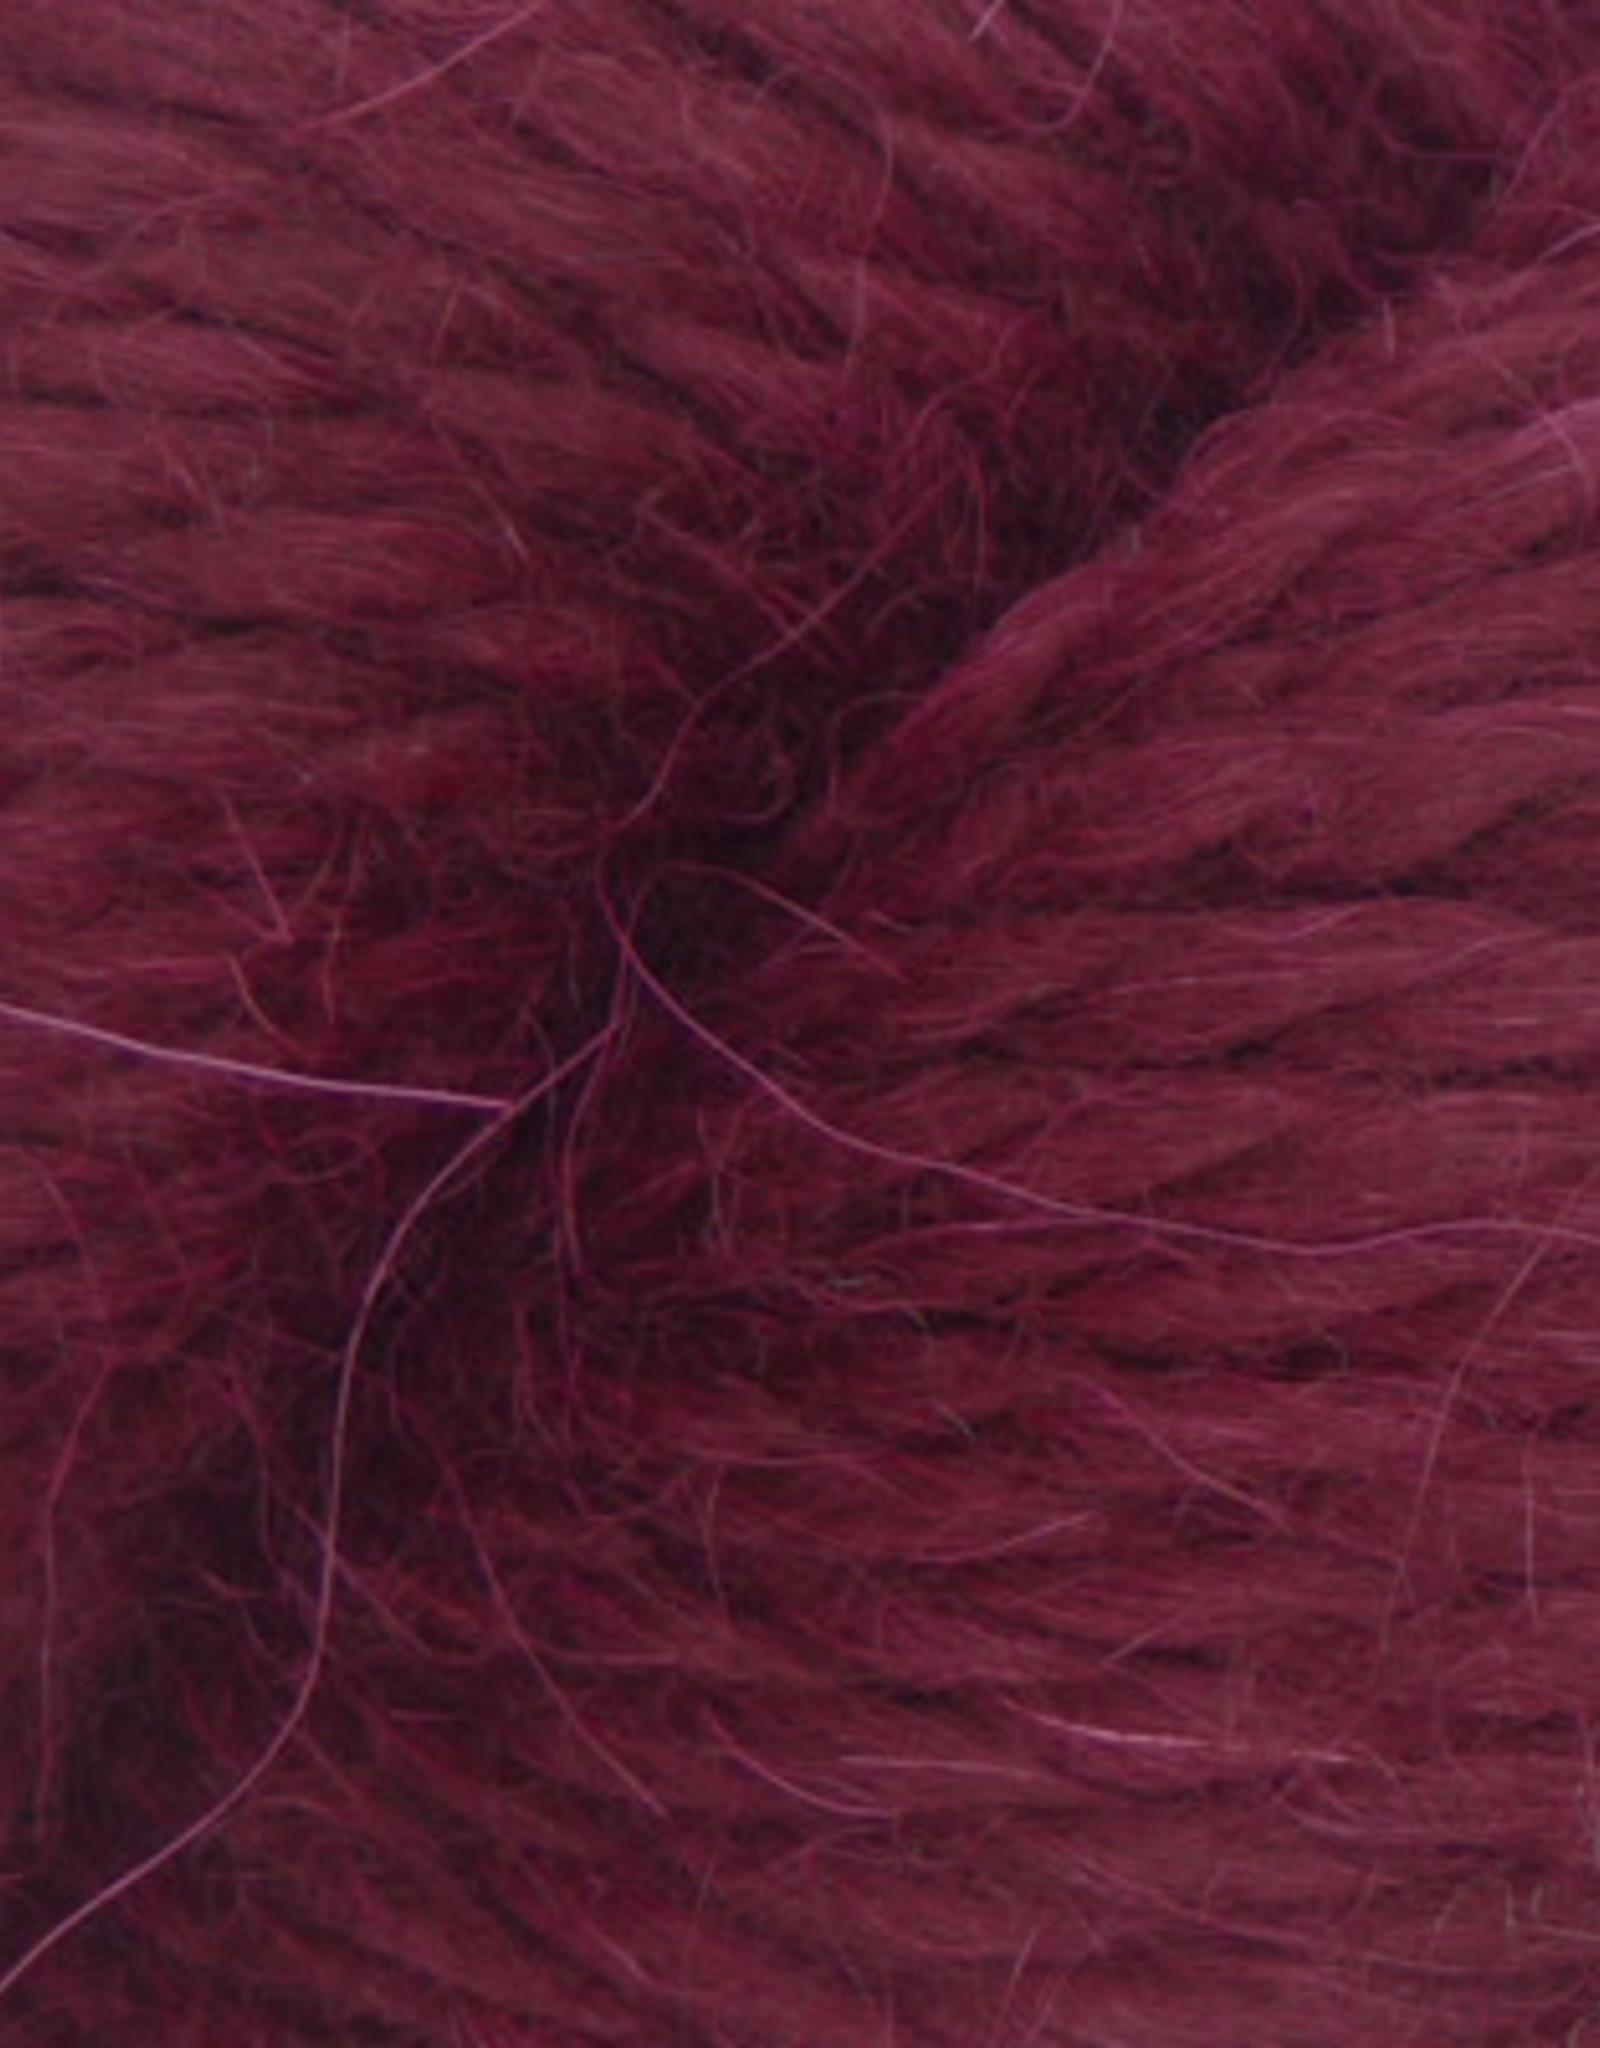 Estelle Alpaca Merino CHUNKY - 204  Wine